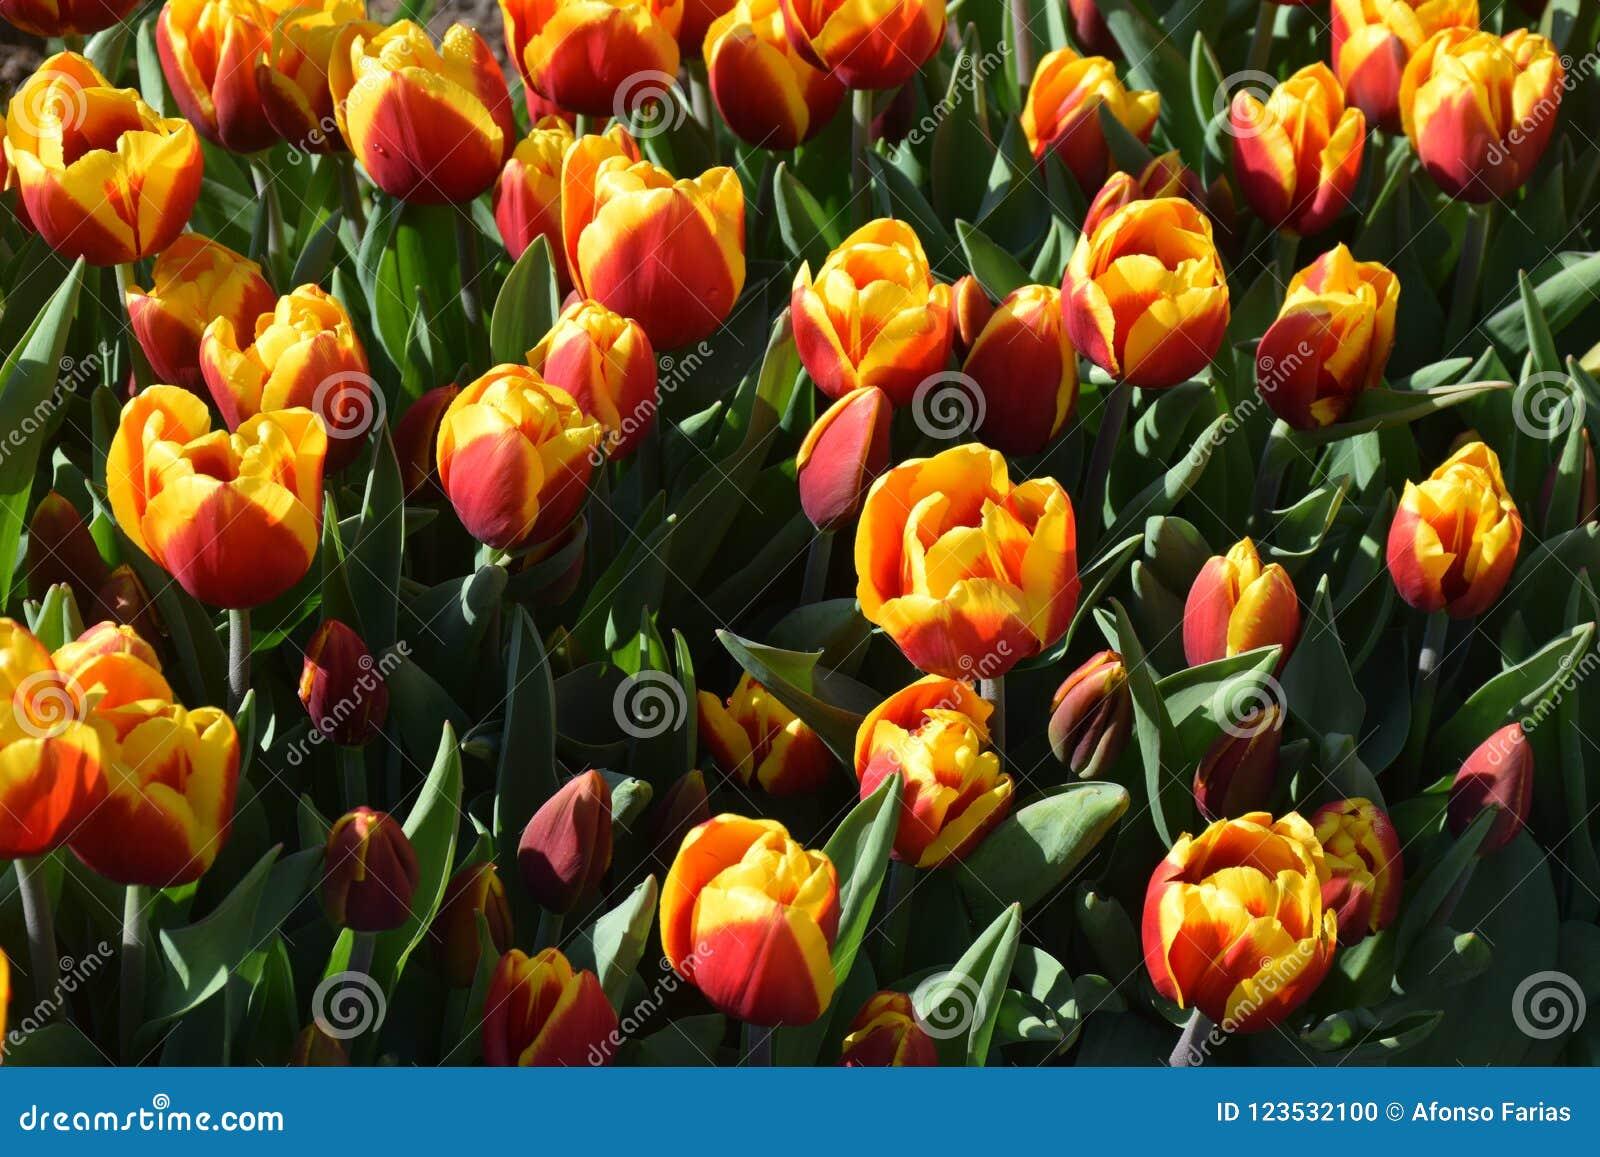 Tulipani rossi ed arancio nei giardini di Keukenhof, Paesi Bassi